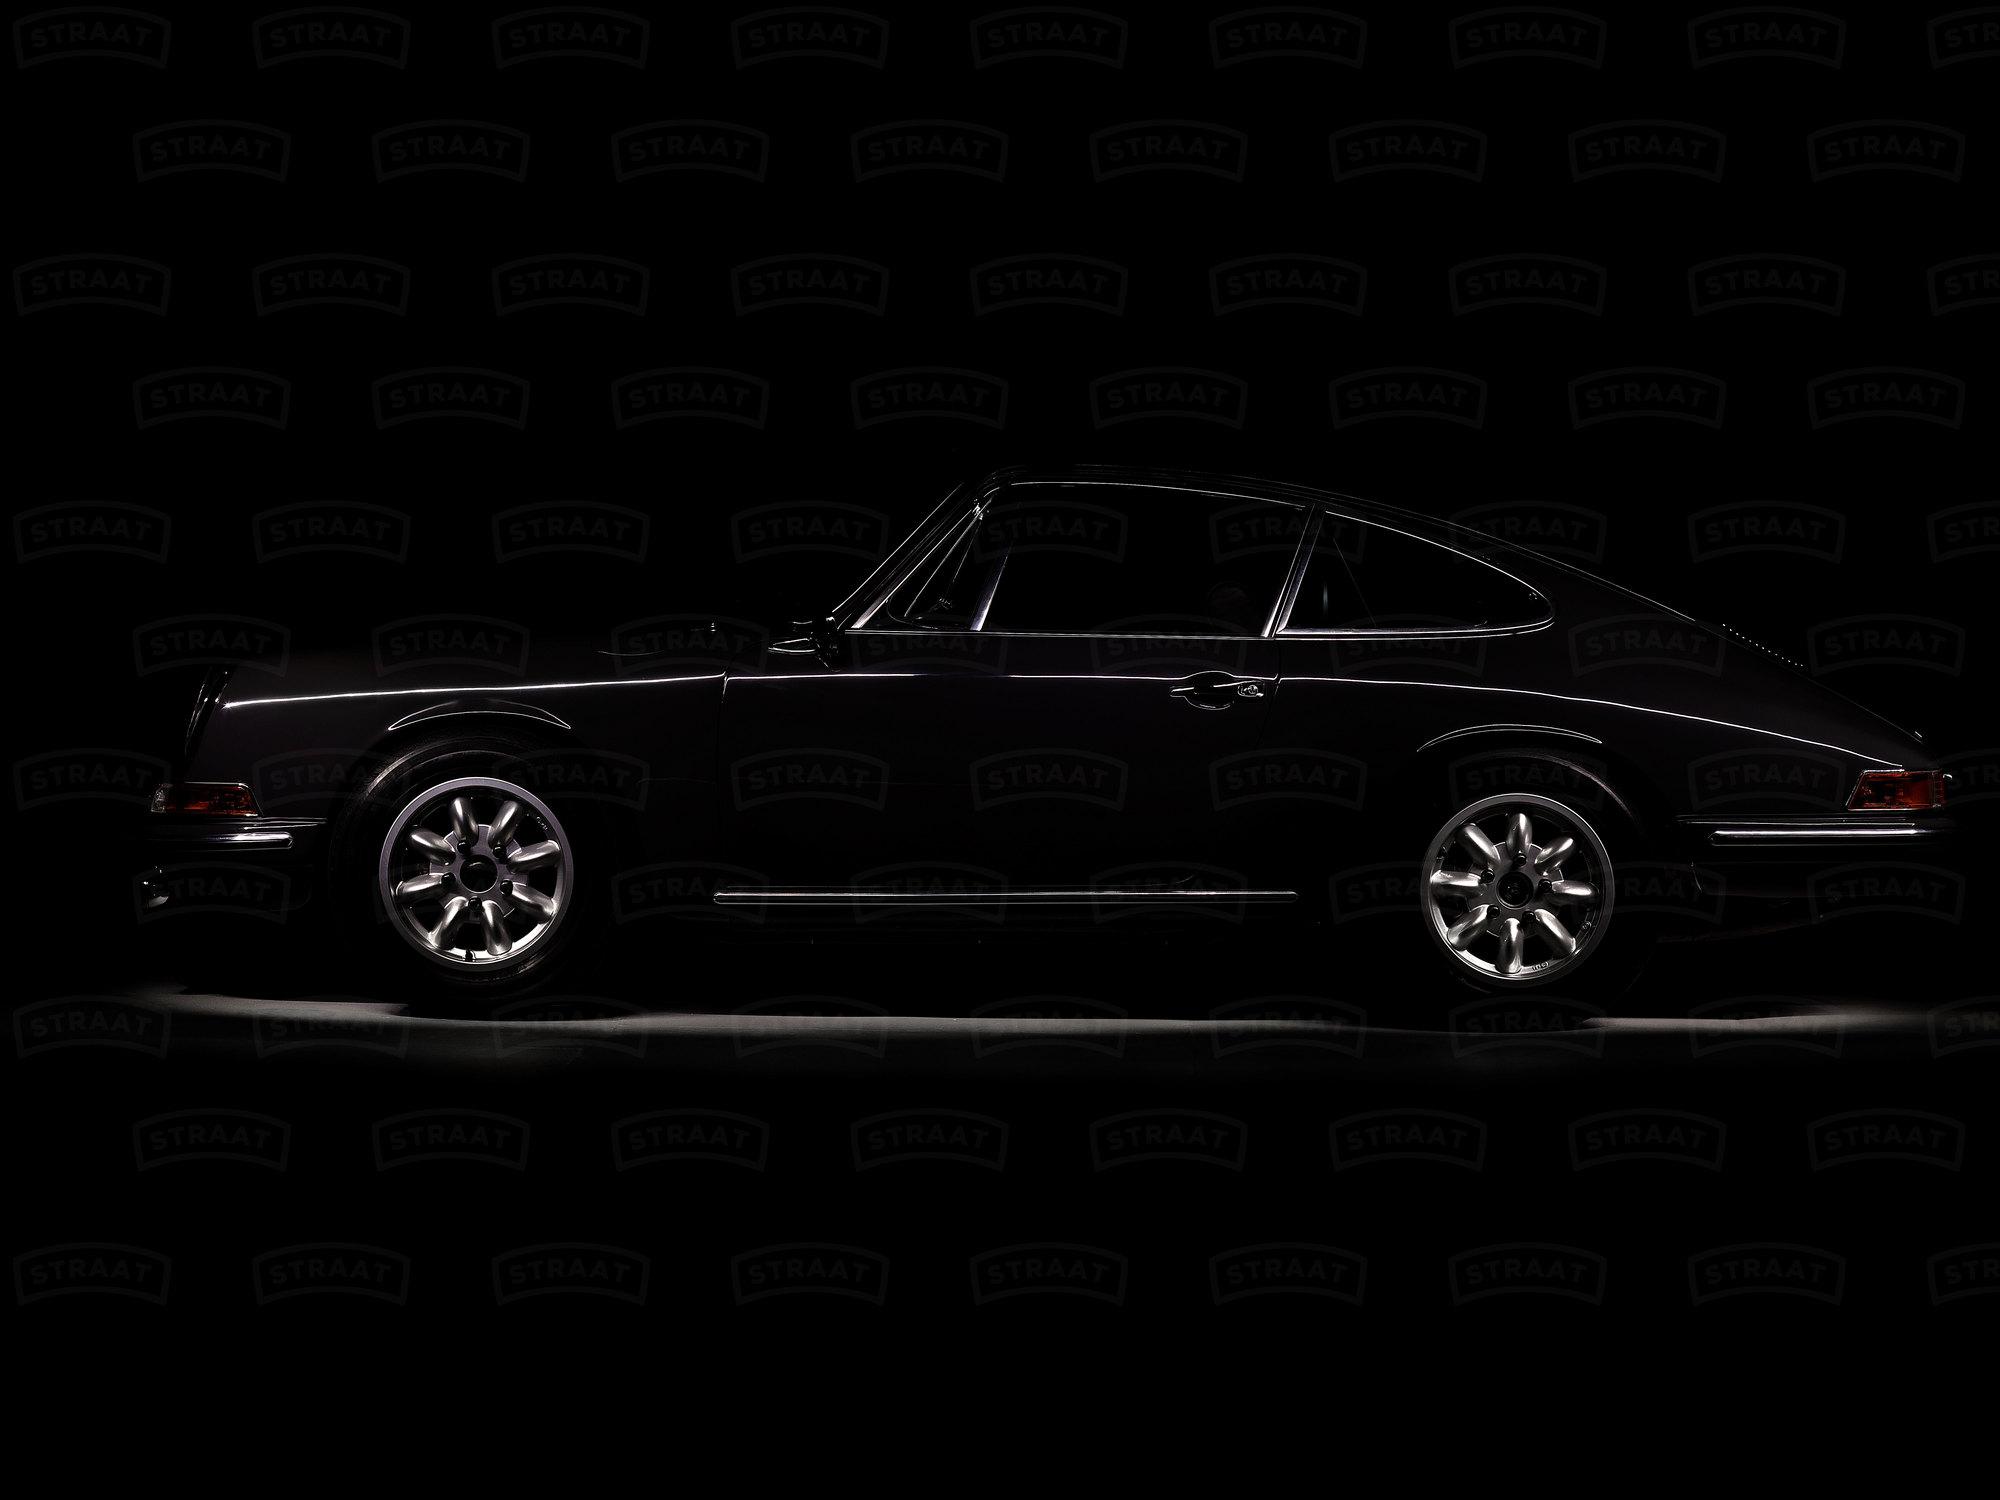 STRAAT - 1968 Porsche – Slate Gray